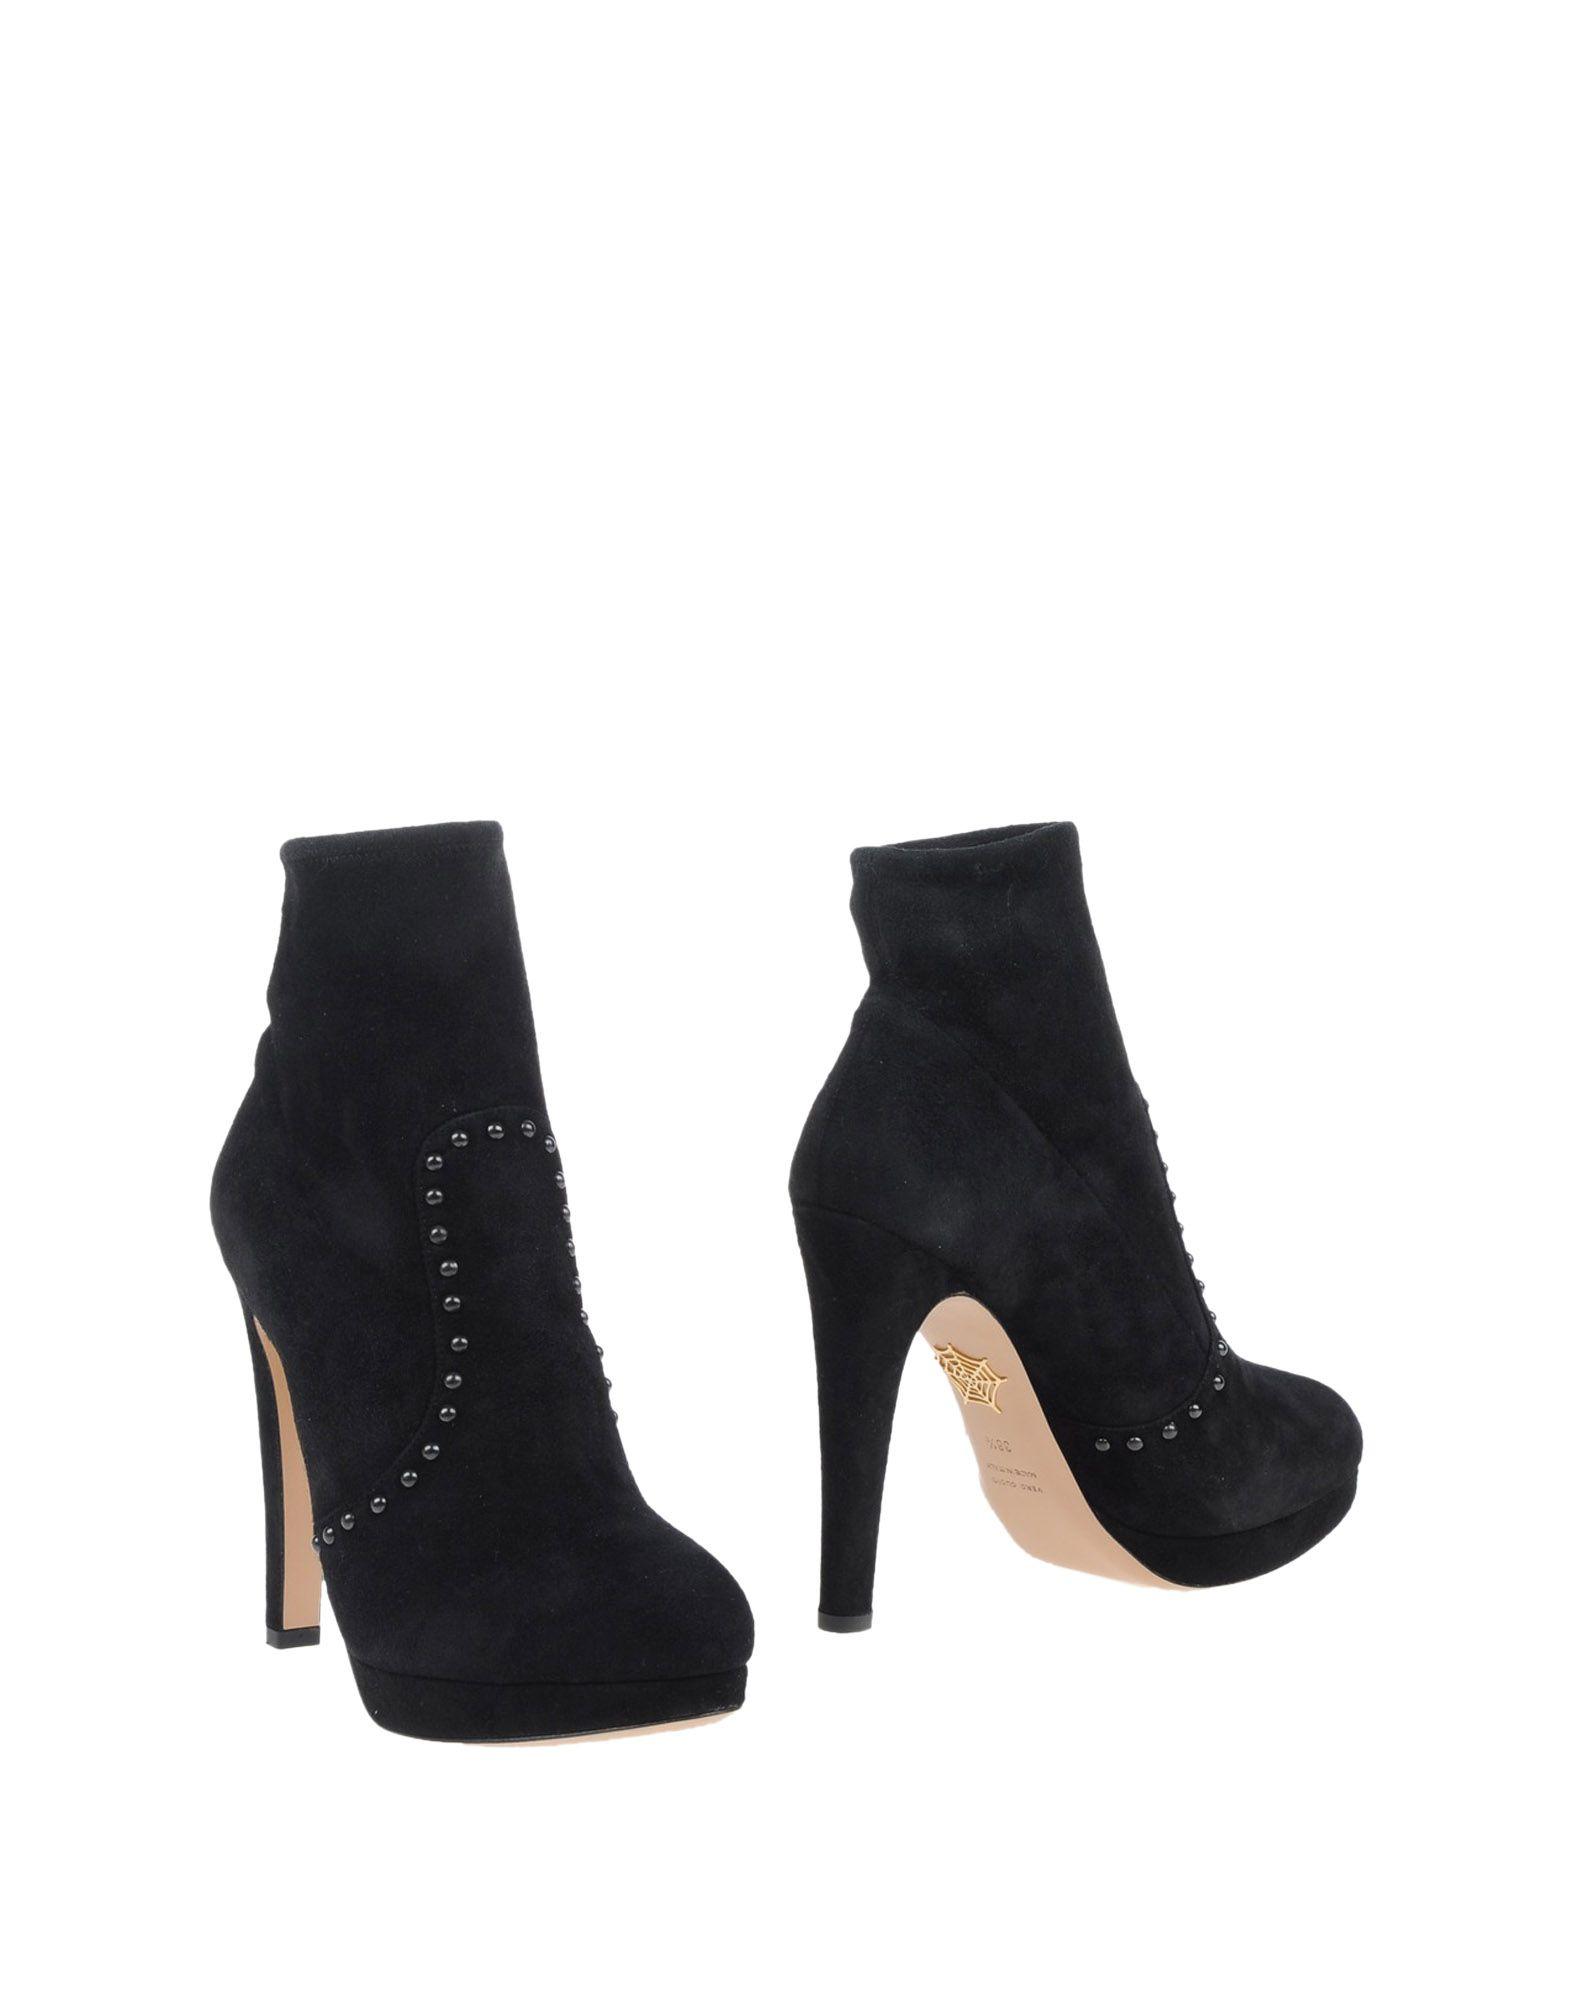 CHARLOTTE OLYMPIA Полусапоги и высокие ботинки charlotte olympia эспадрильи из кожи и льна mischievous flats